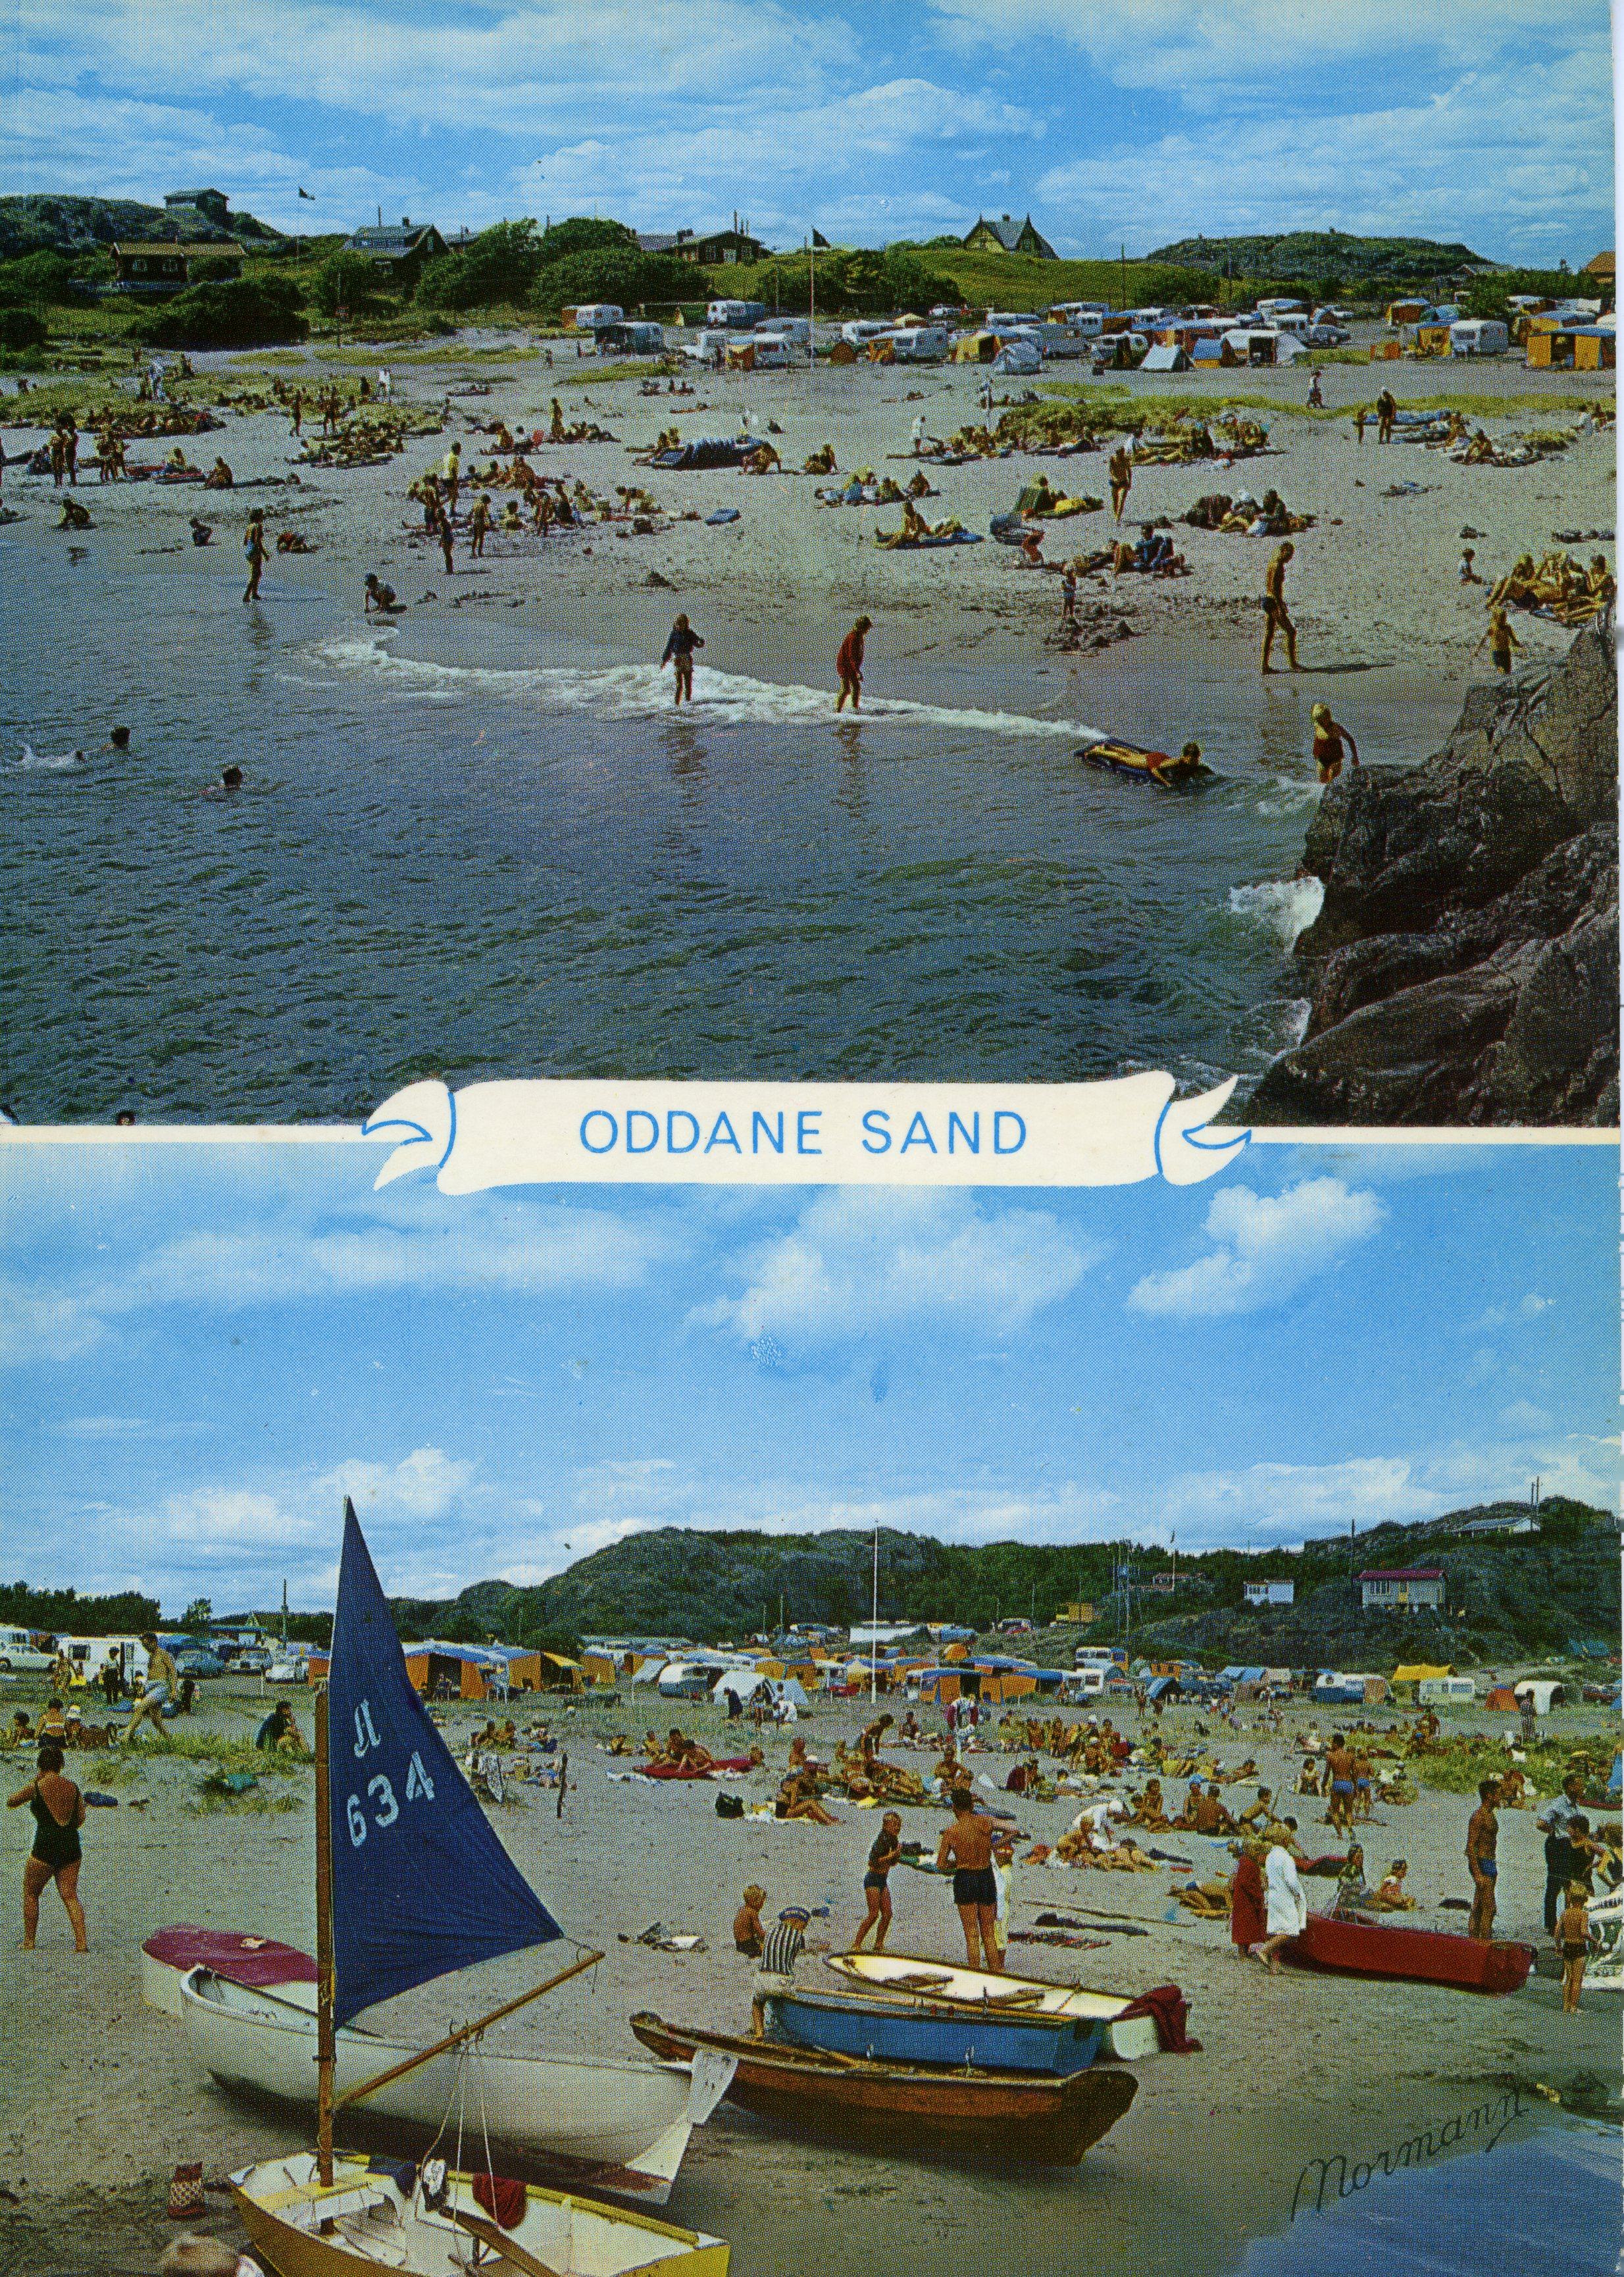 Oddane Sand.jpg